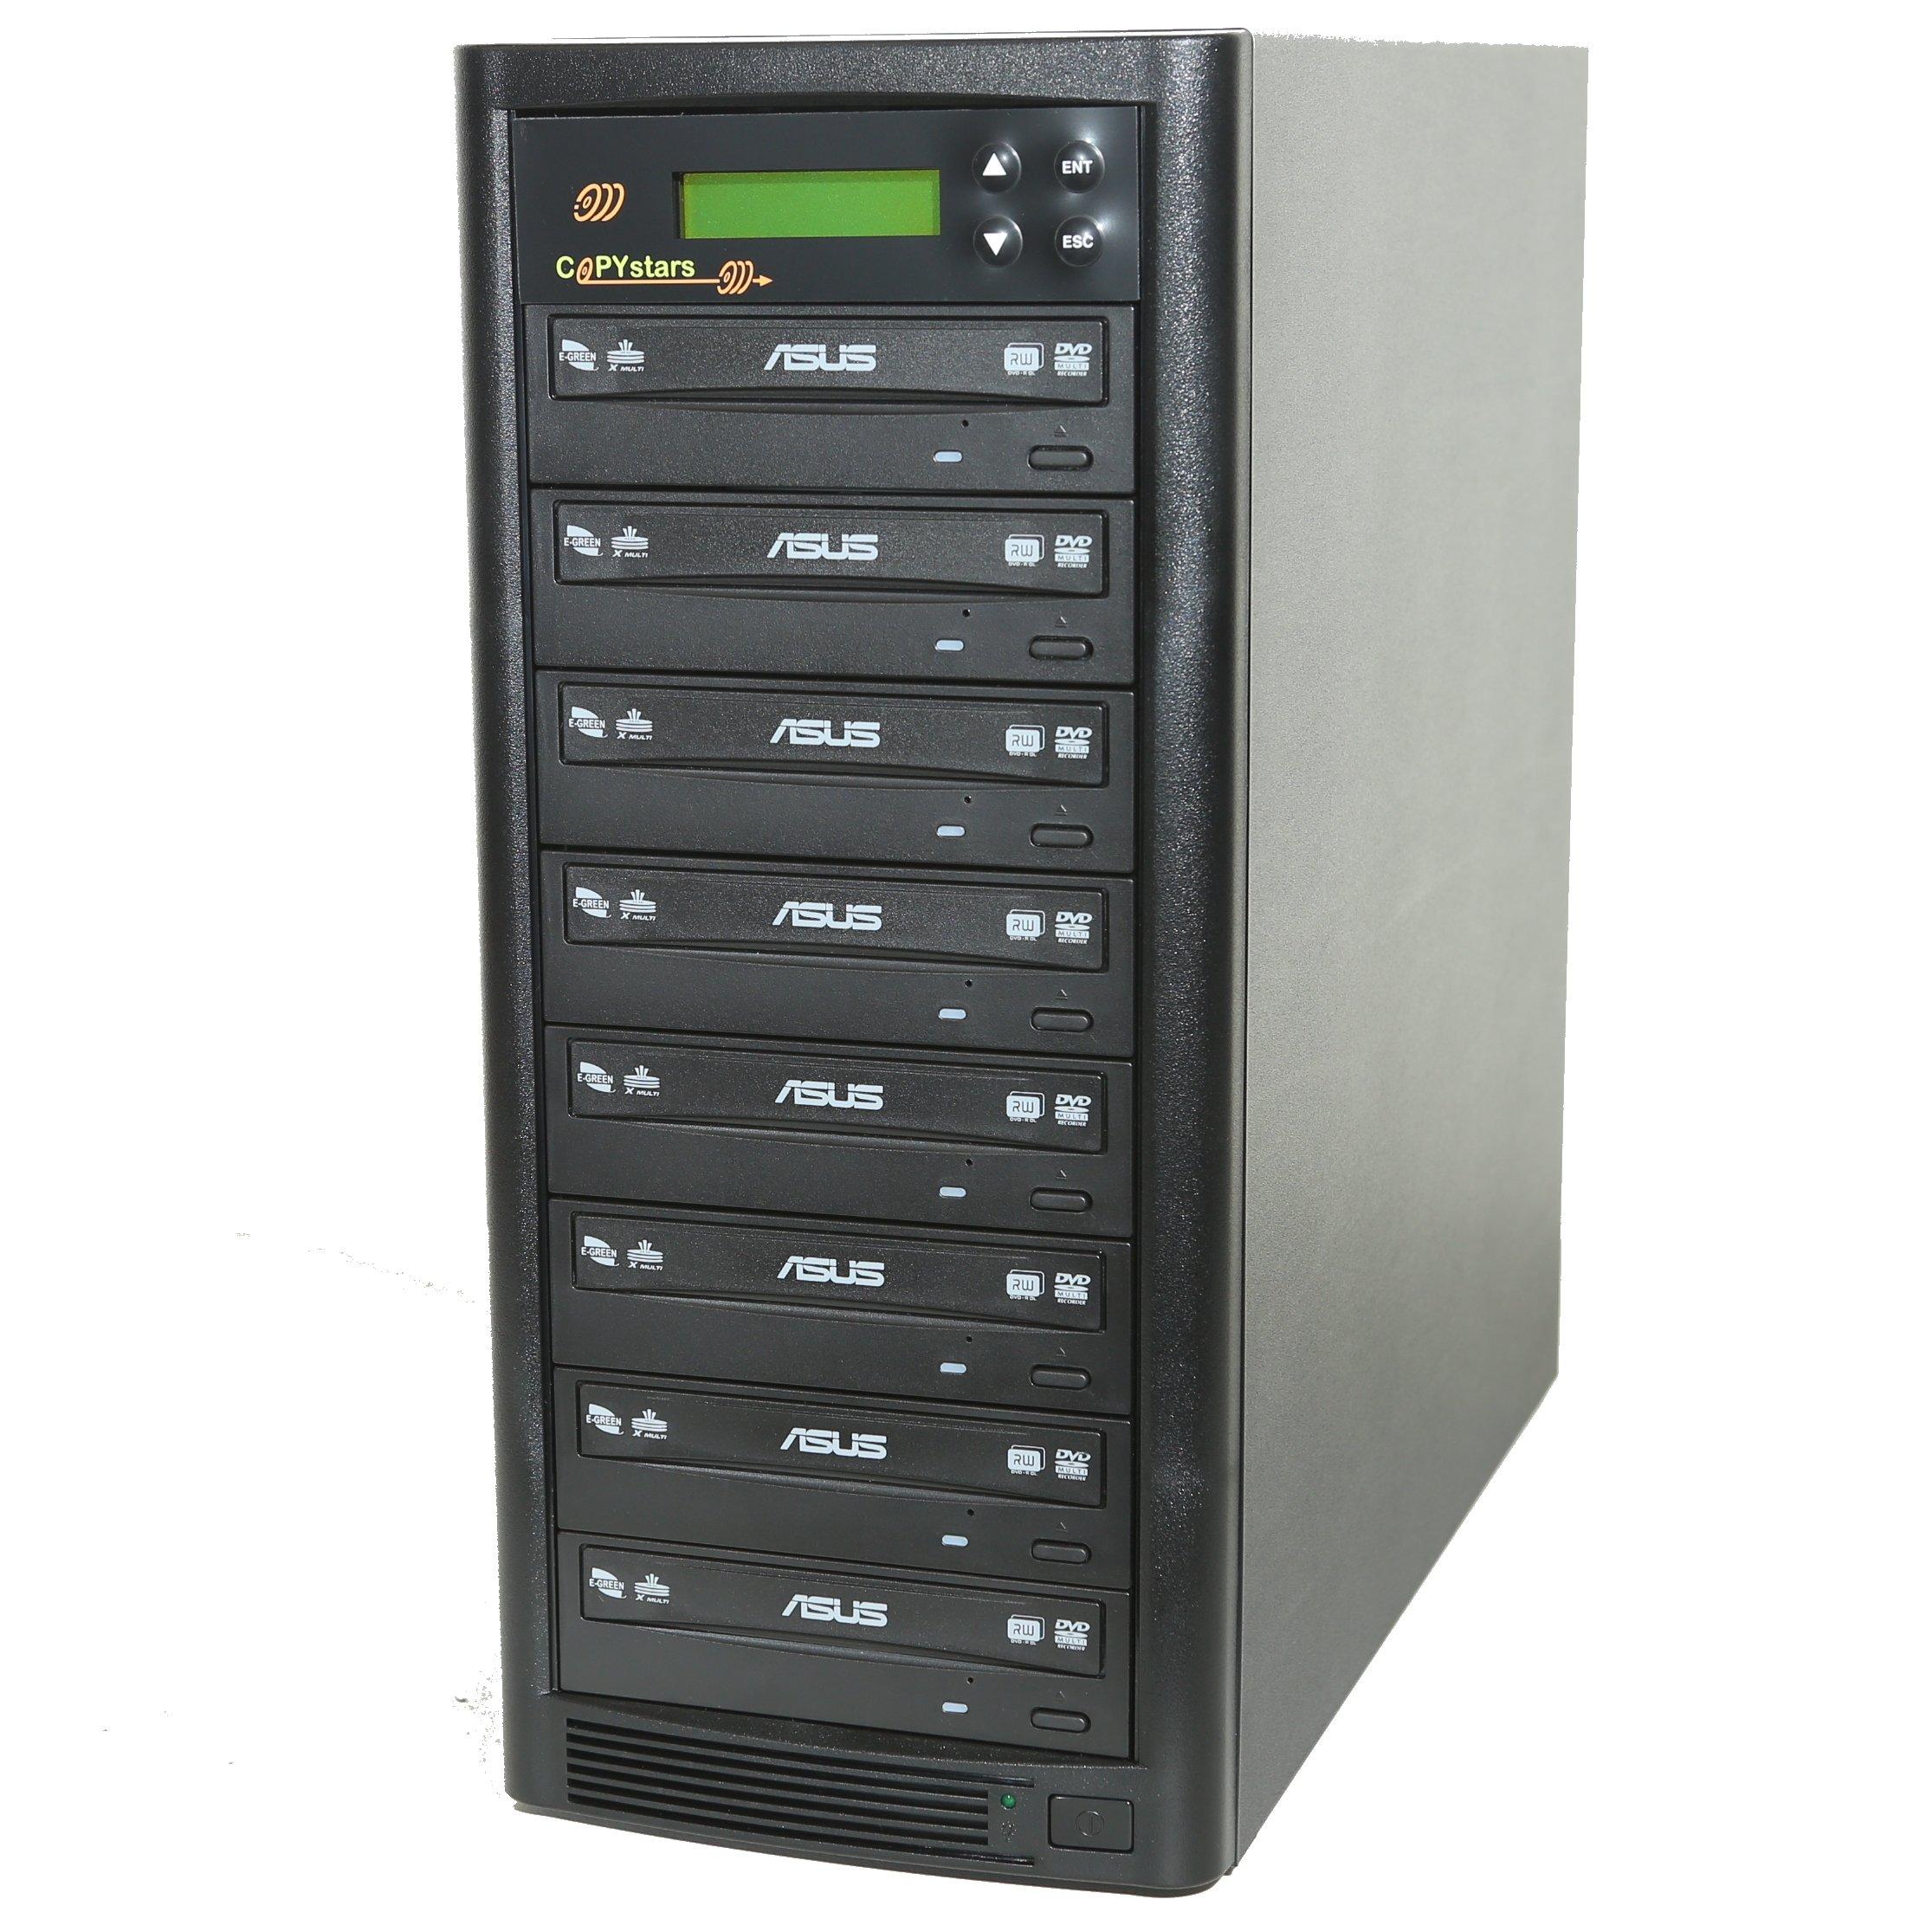 DVD Duplicator Sata 1 to 7 24X Dvd-burner Drive CD DVD Duplicator Writer Copier Tower by Copystars